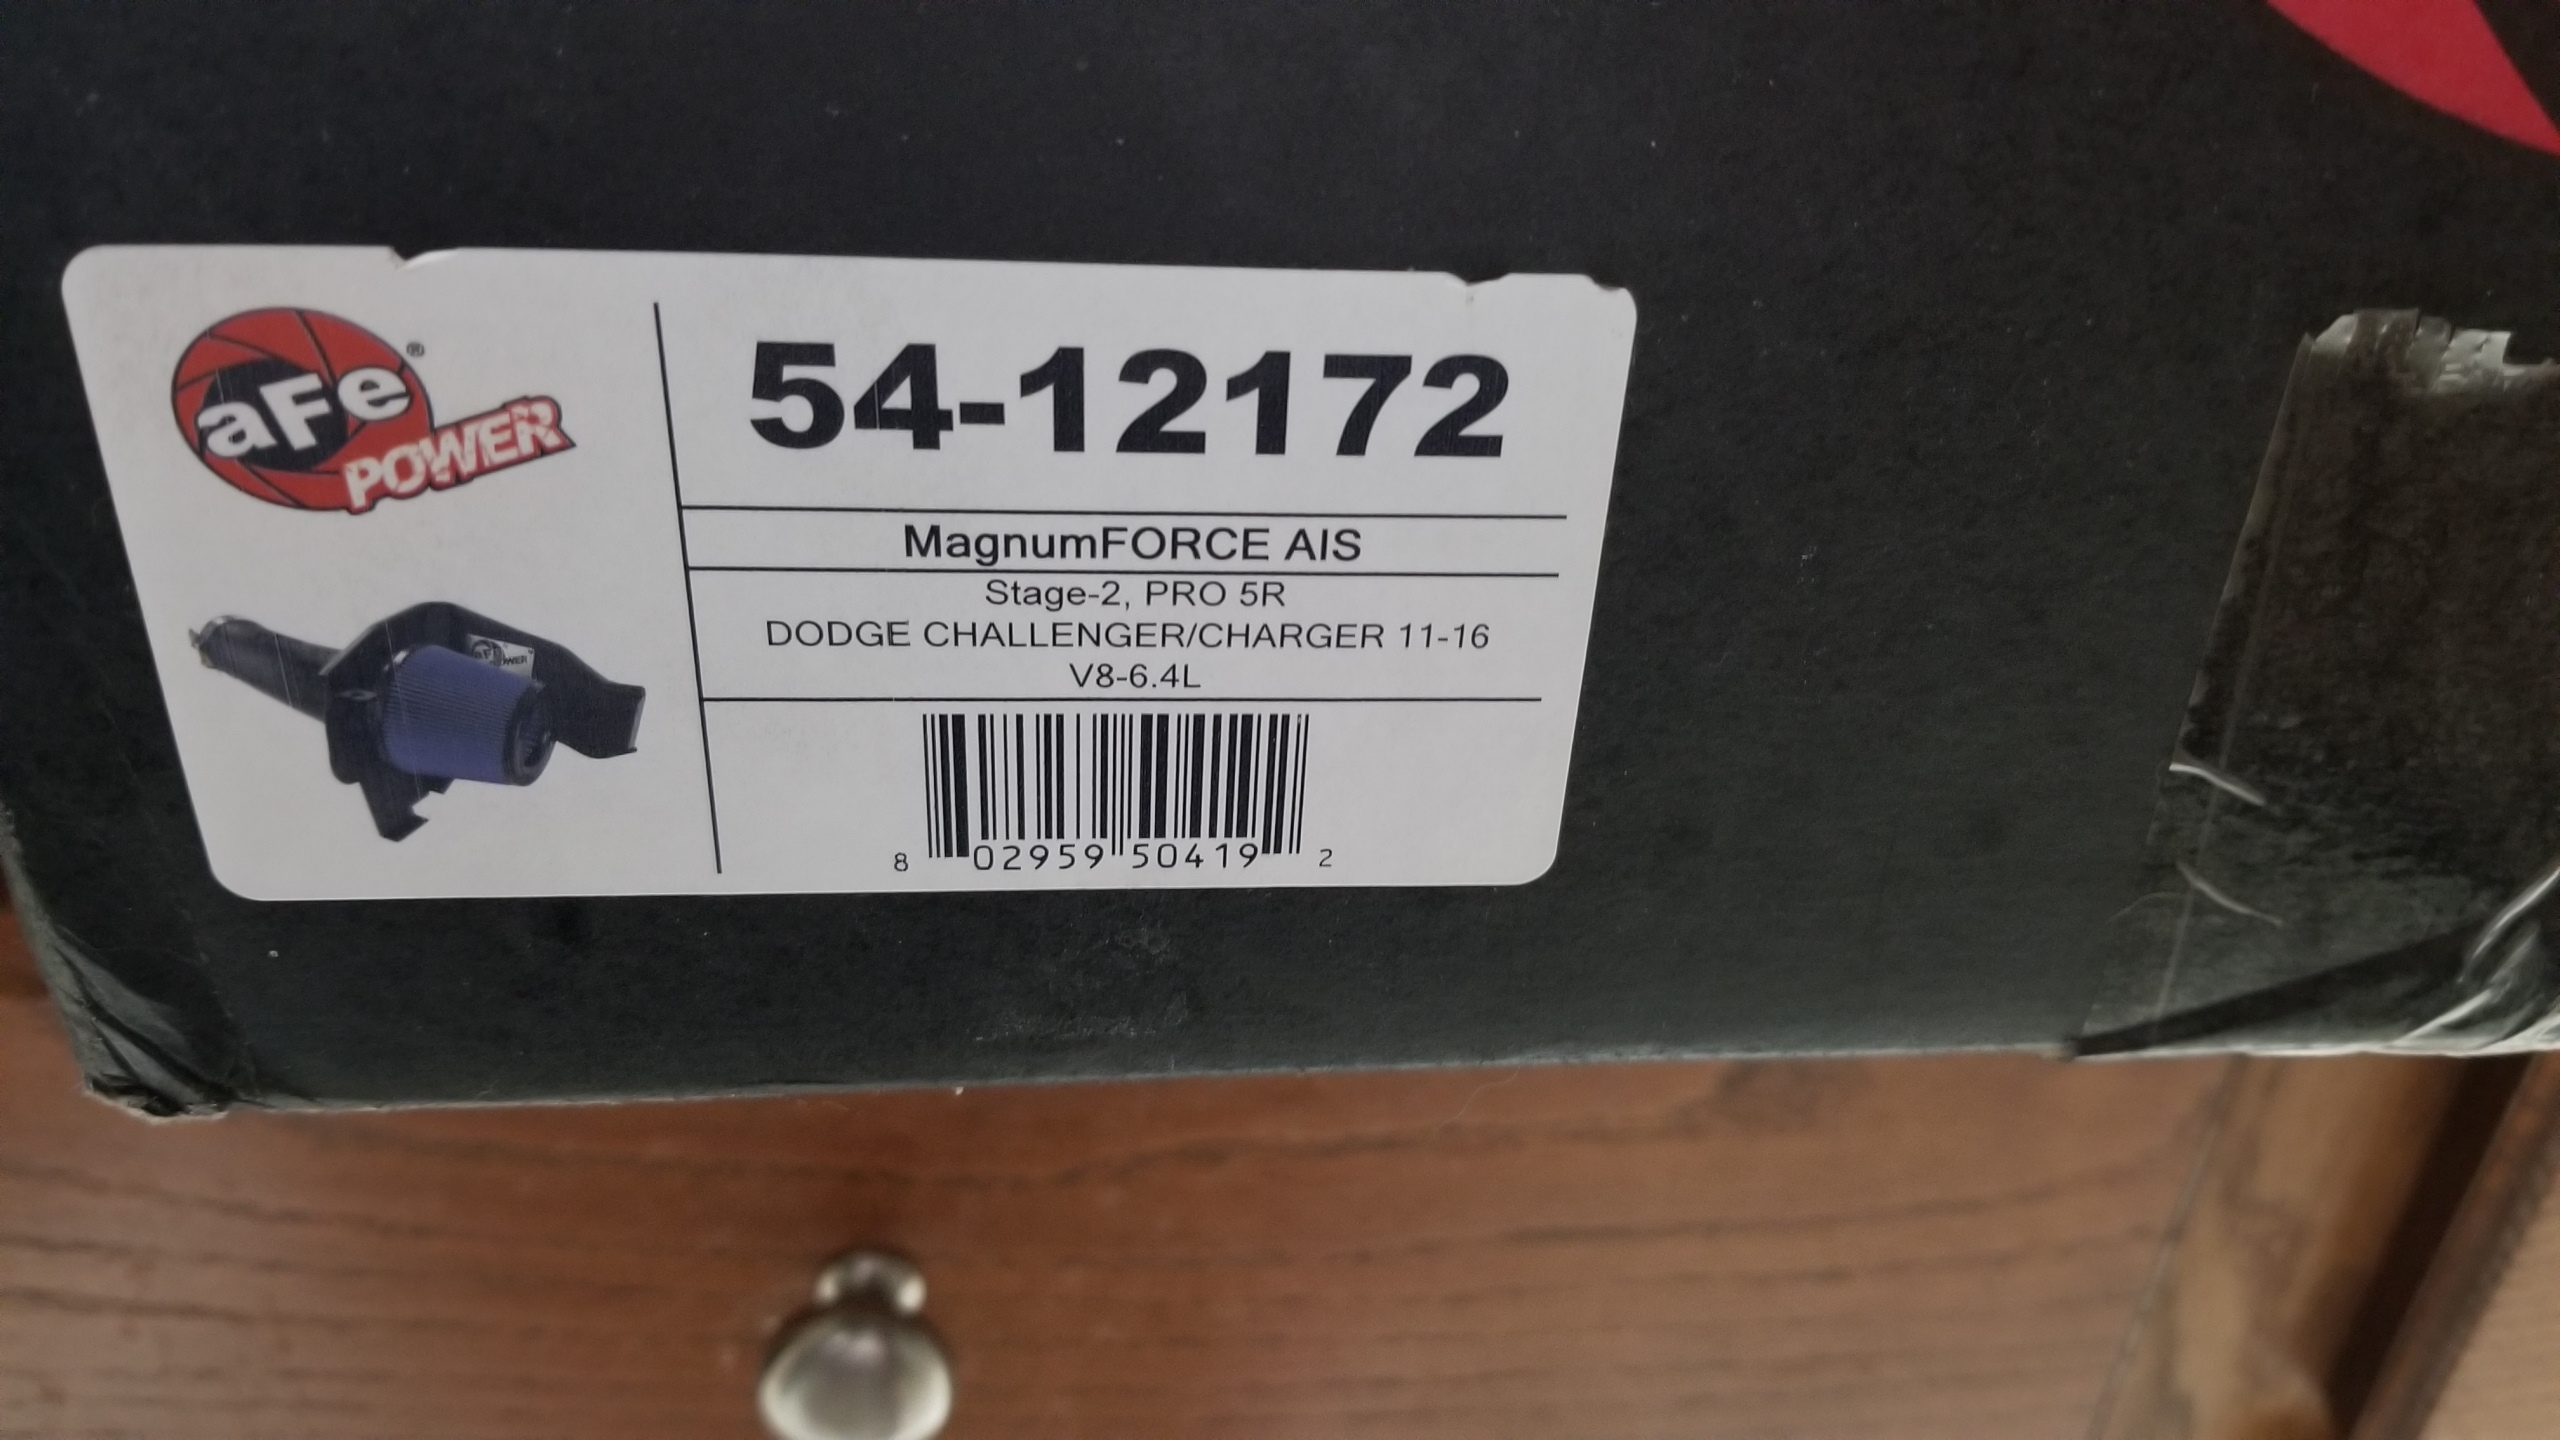 Afe pro 5r intake 392 still in box brand new